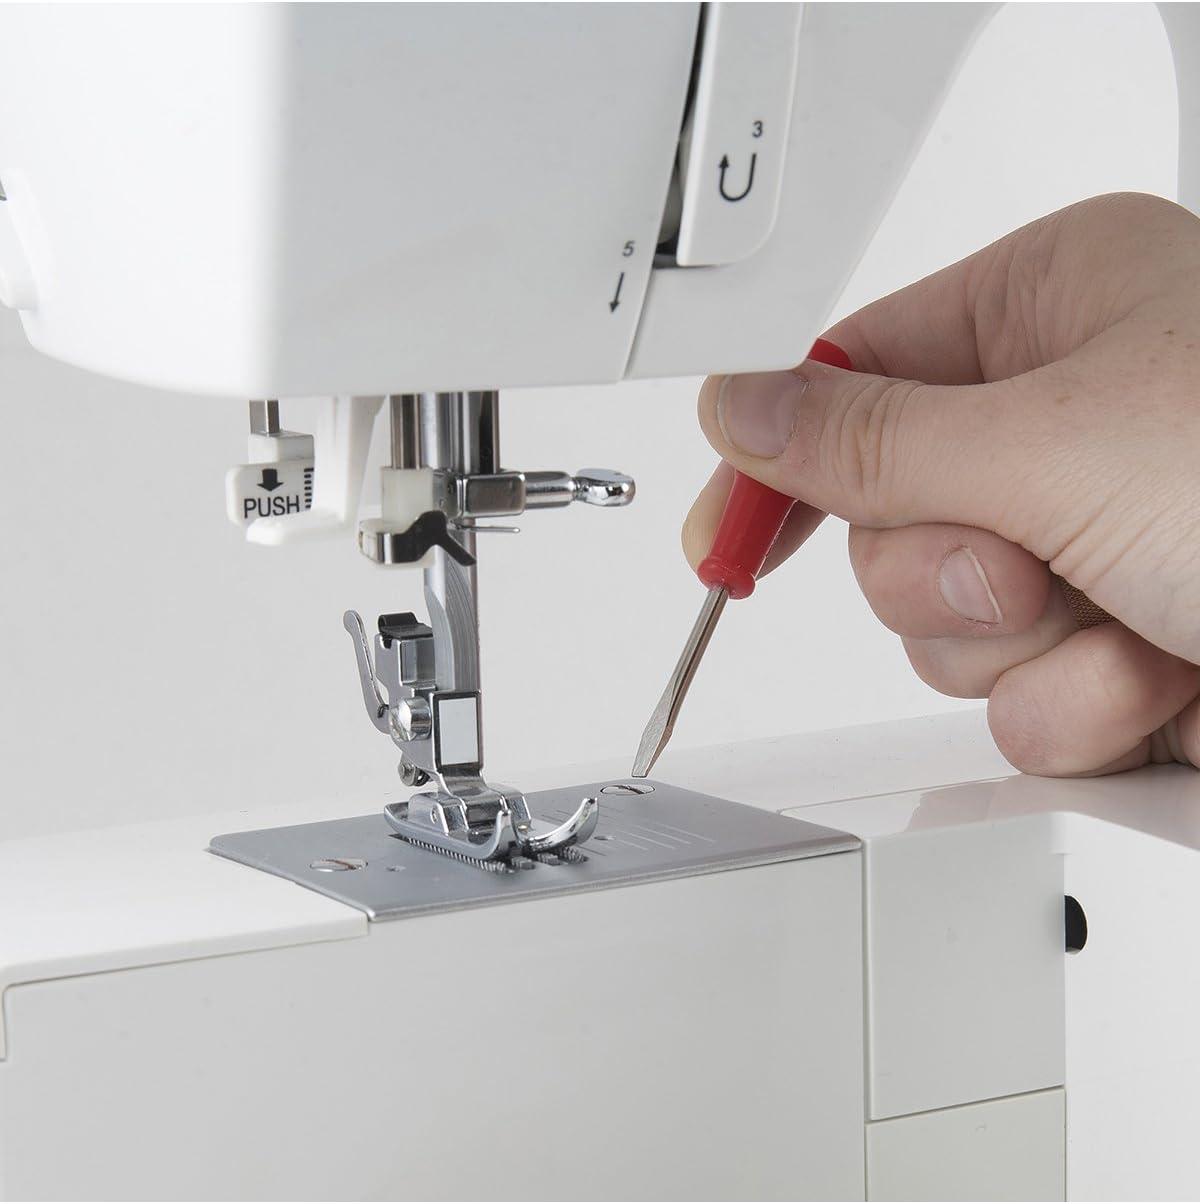 Singer Universal Machine Maintenance Kit